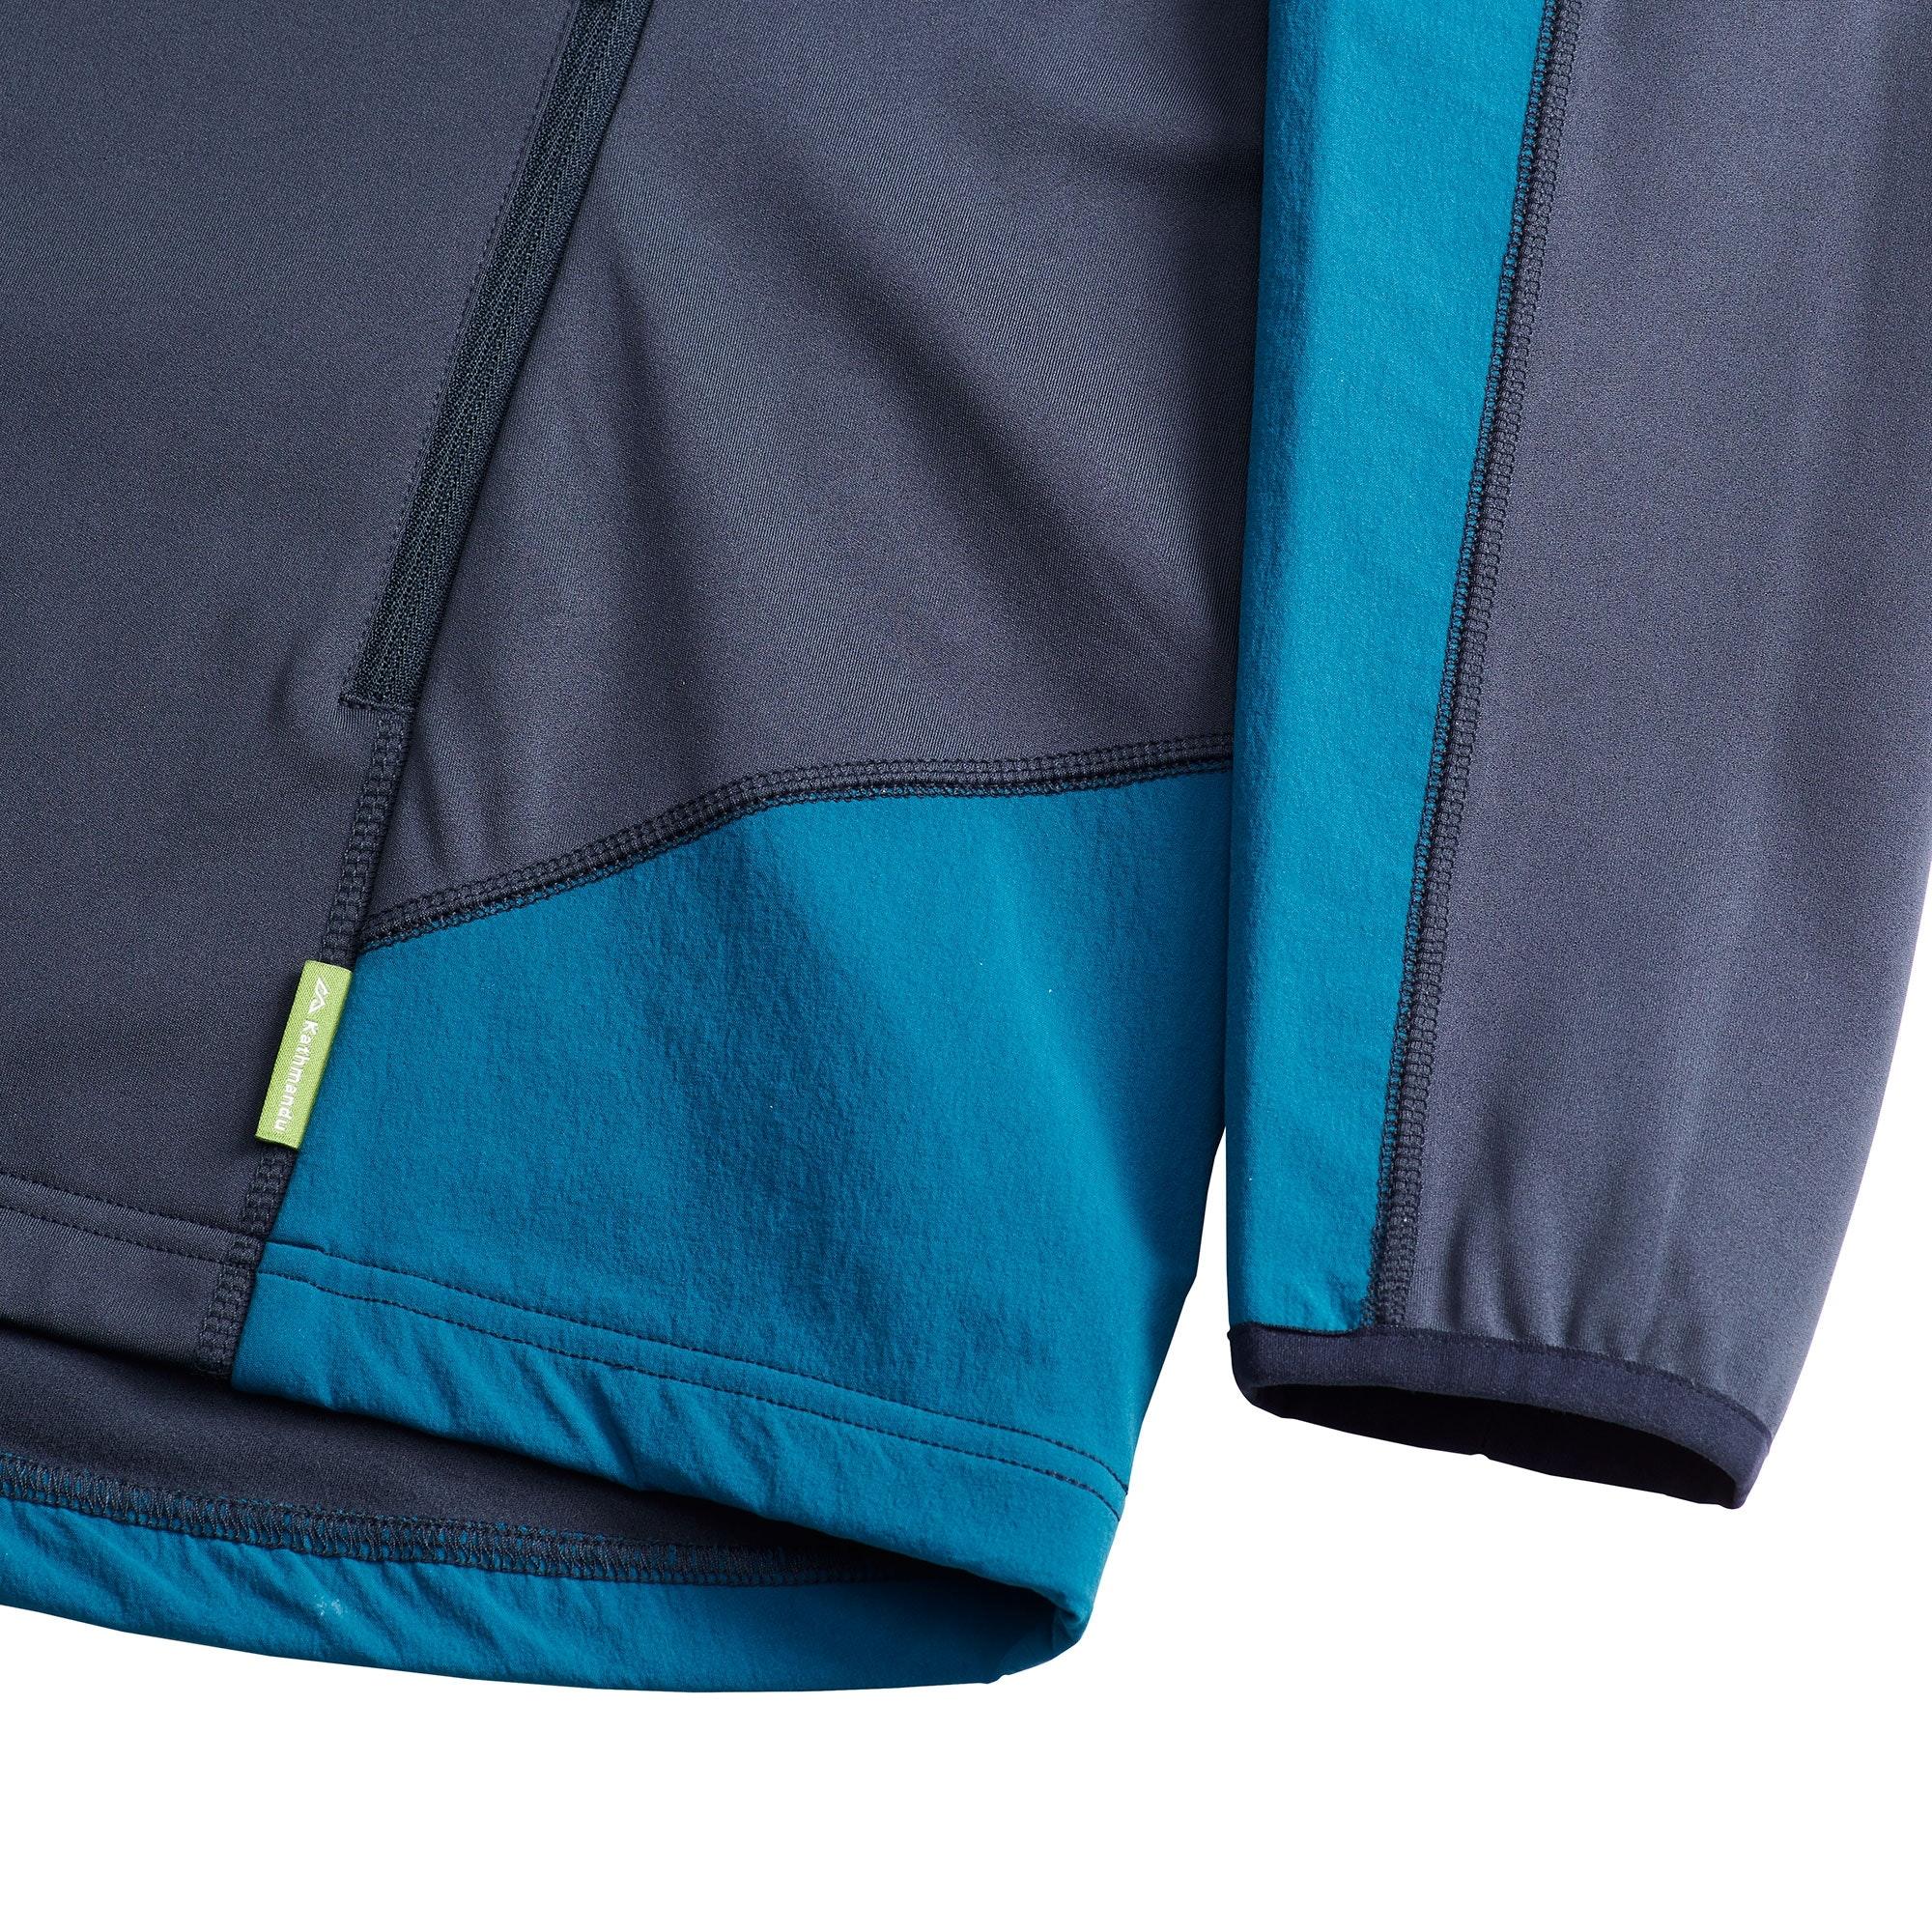 Kathmandu-Escarpar-Women-039-s-Mid-Layer-Hooded-Slim-Fit-Hiking-Fleece-Pullover